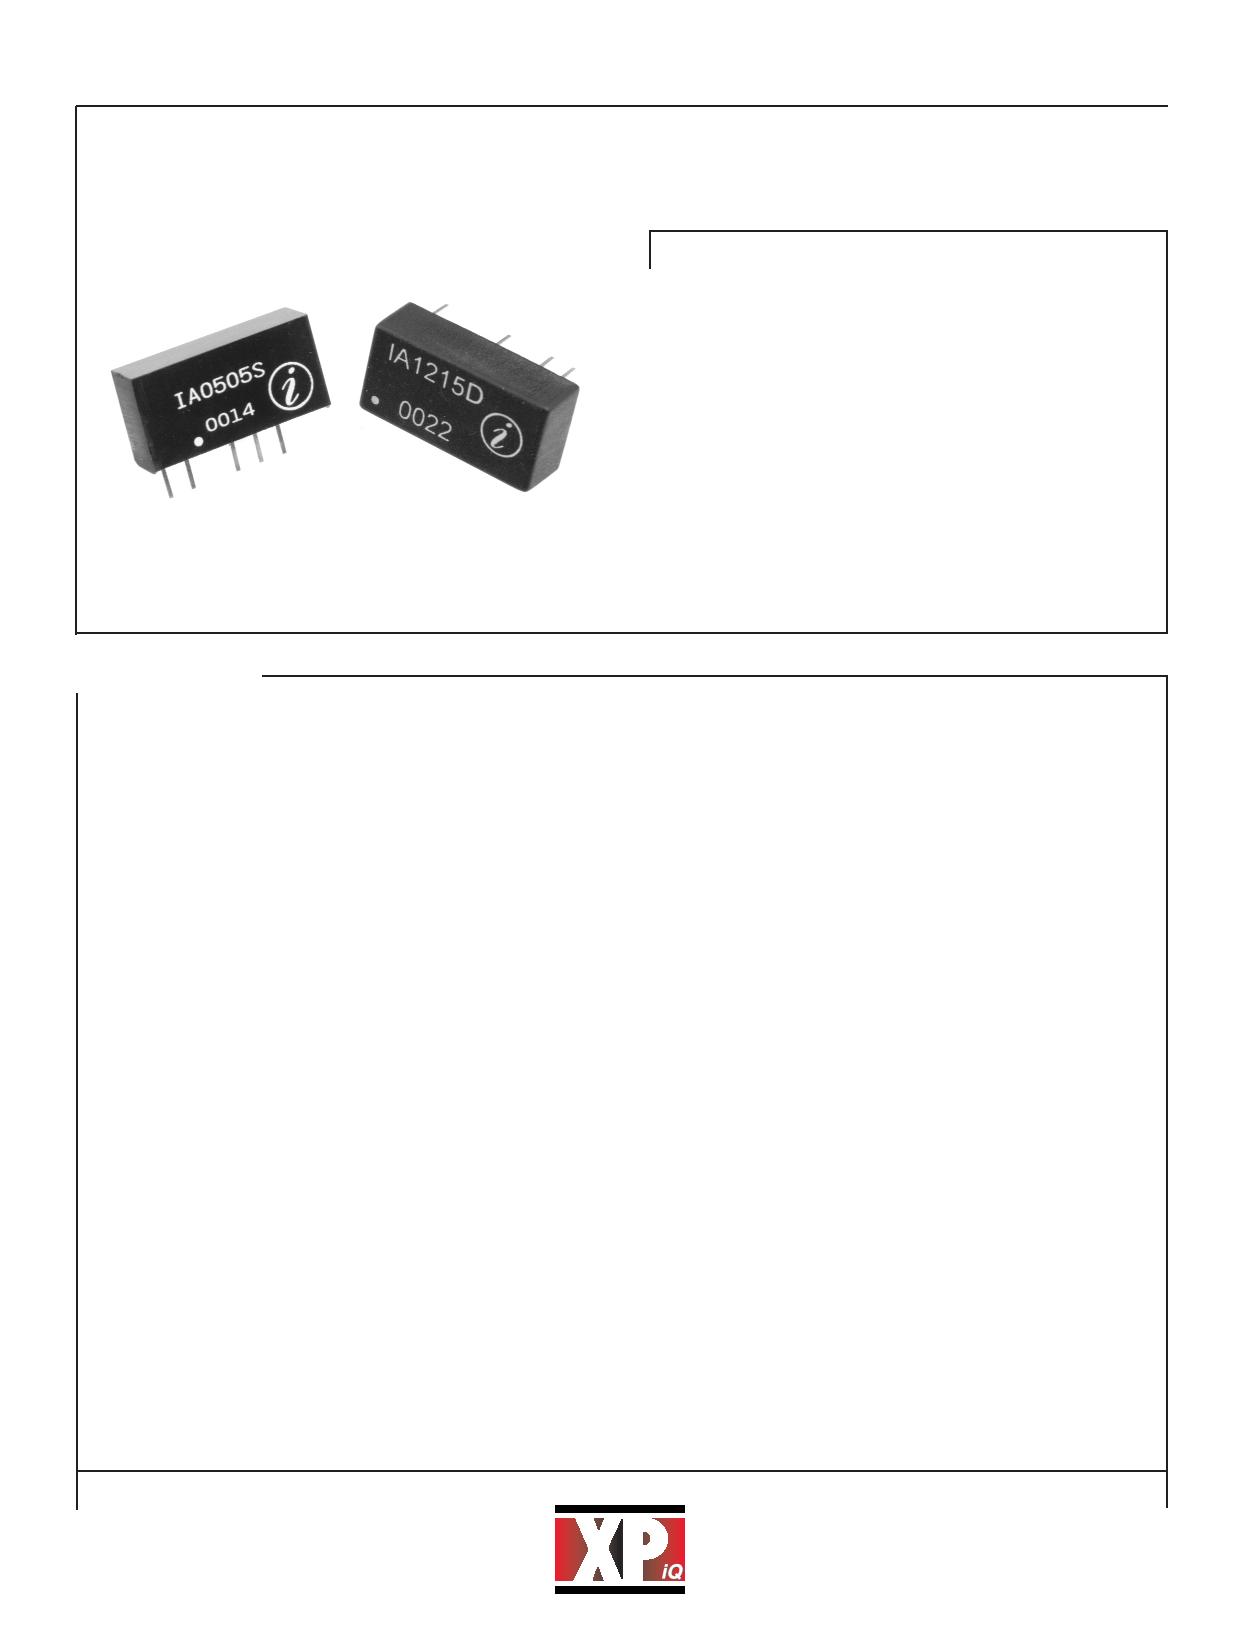 IA1203 datasheet